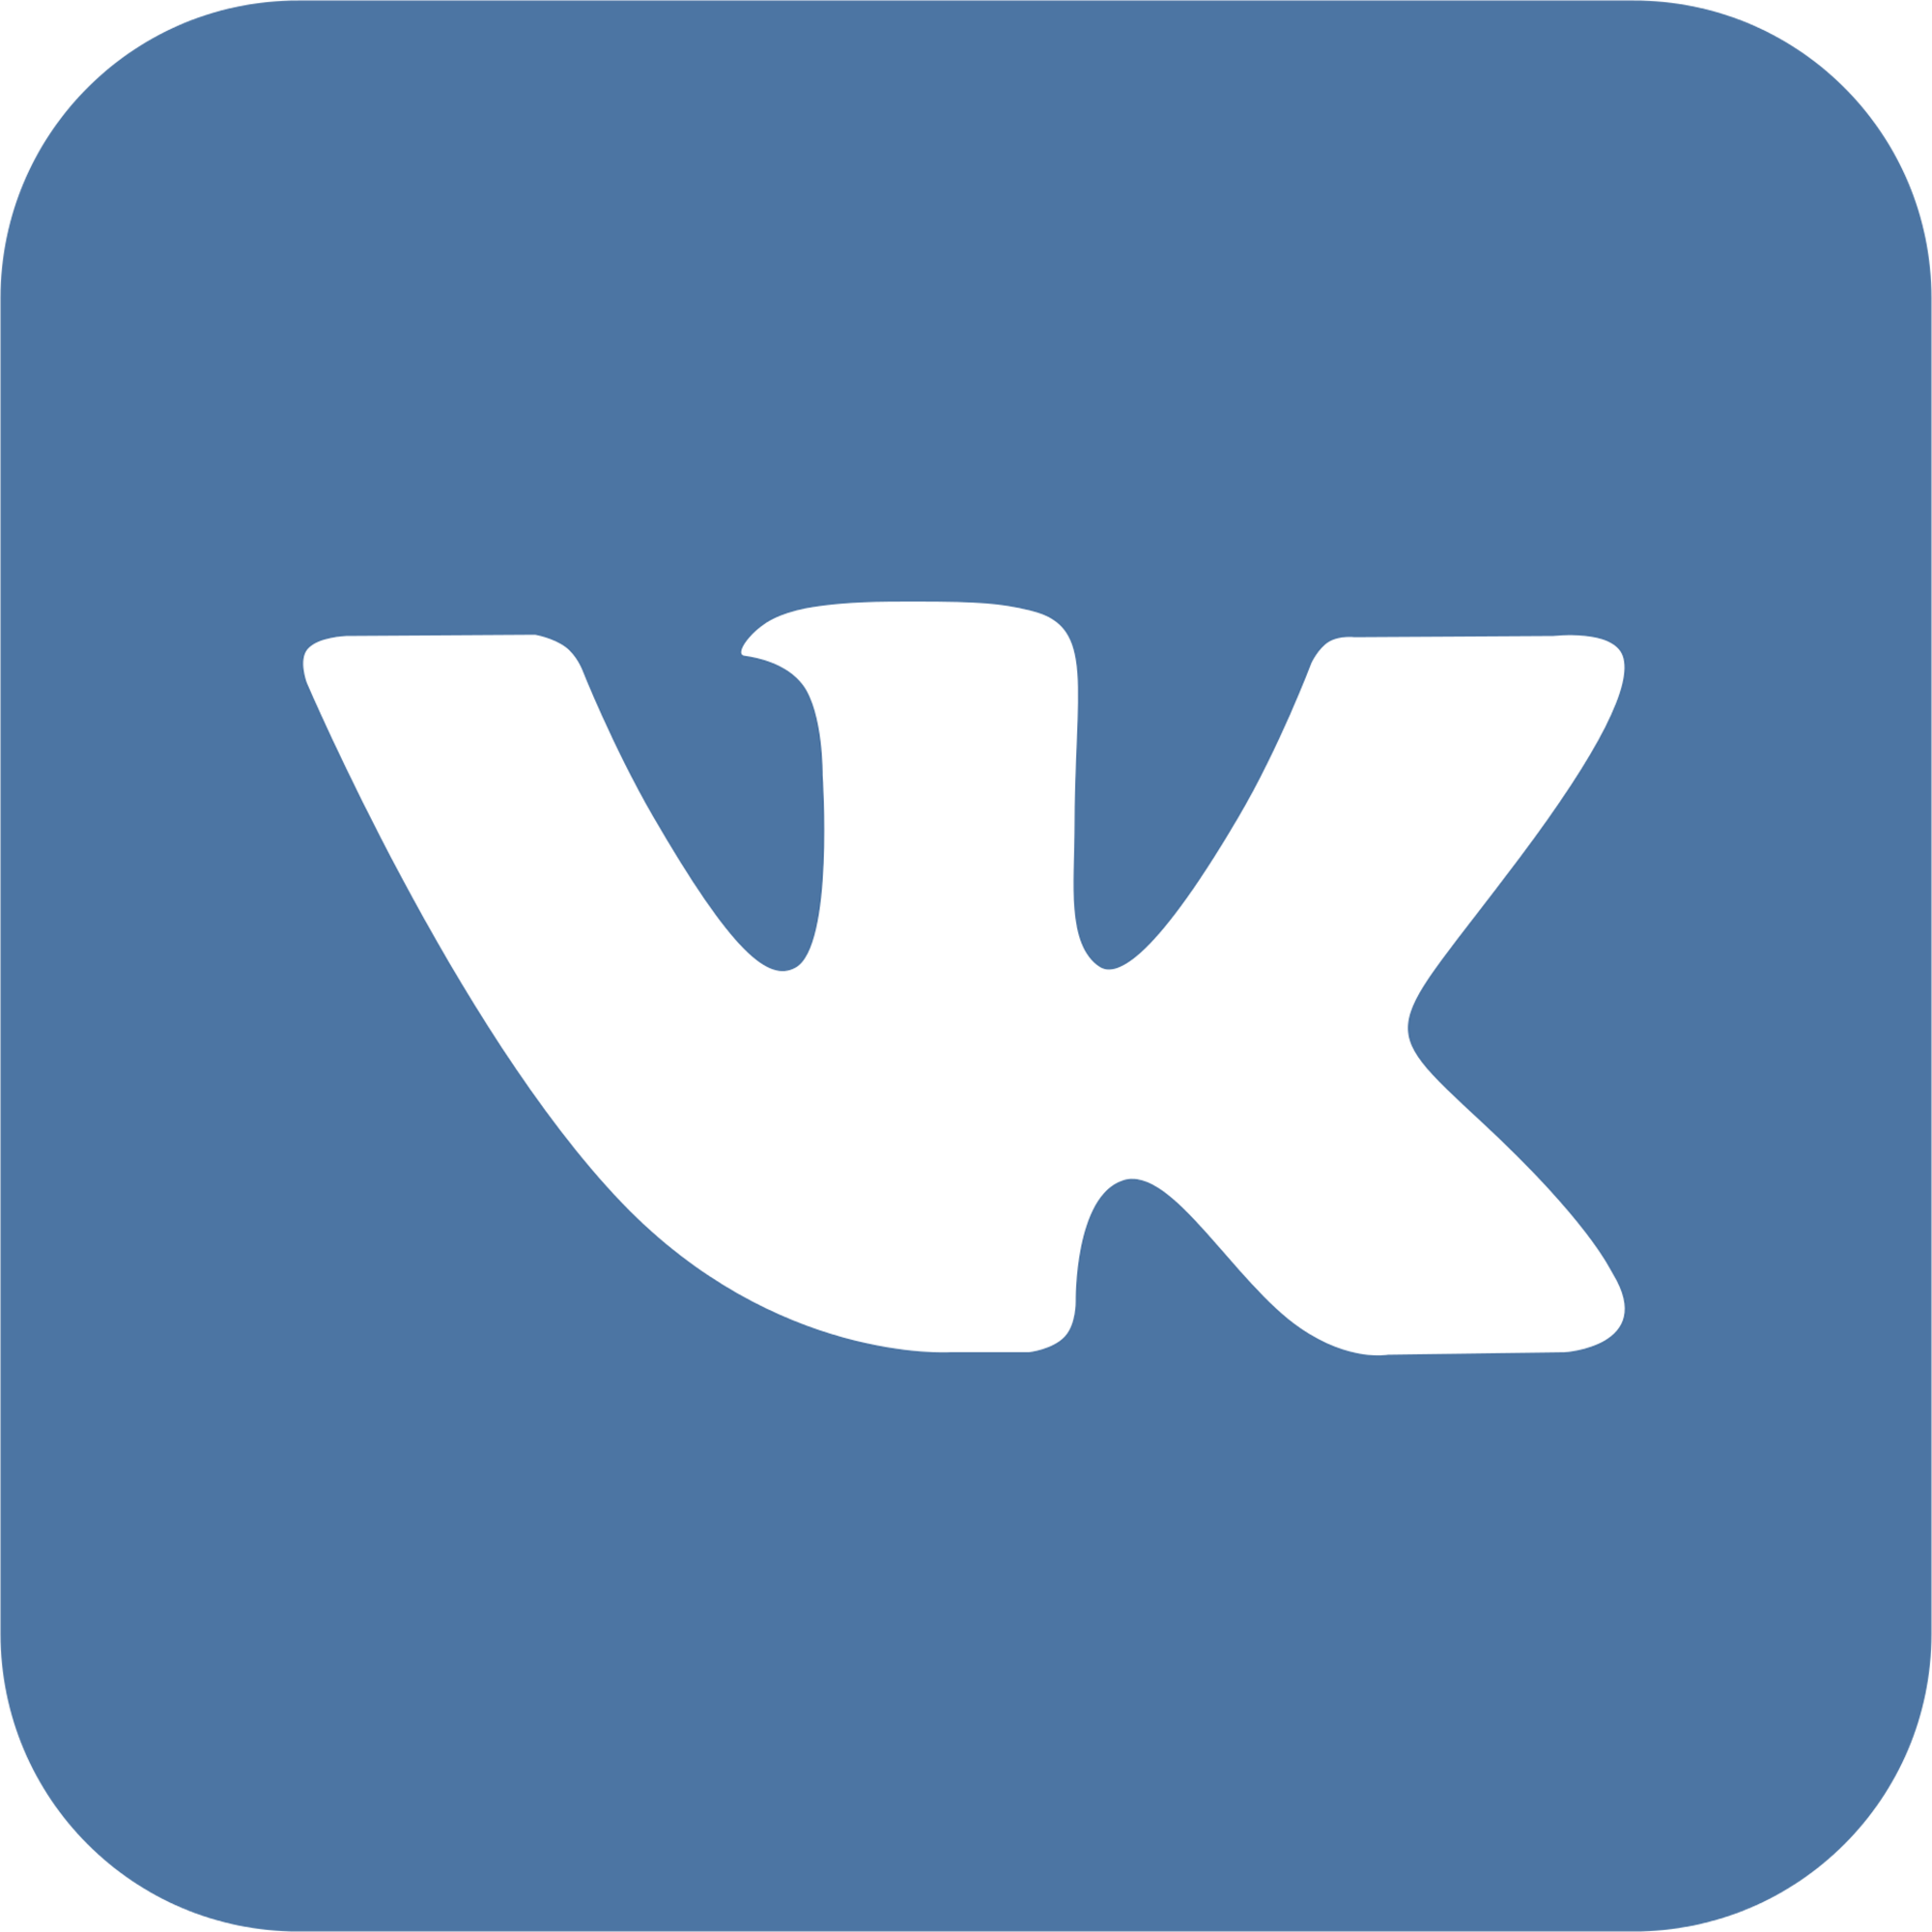 Наращивание волос - Вконтакте